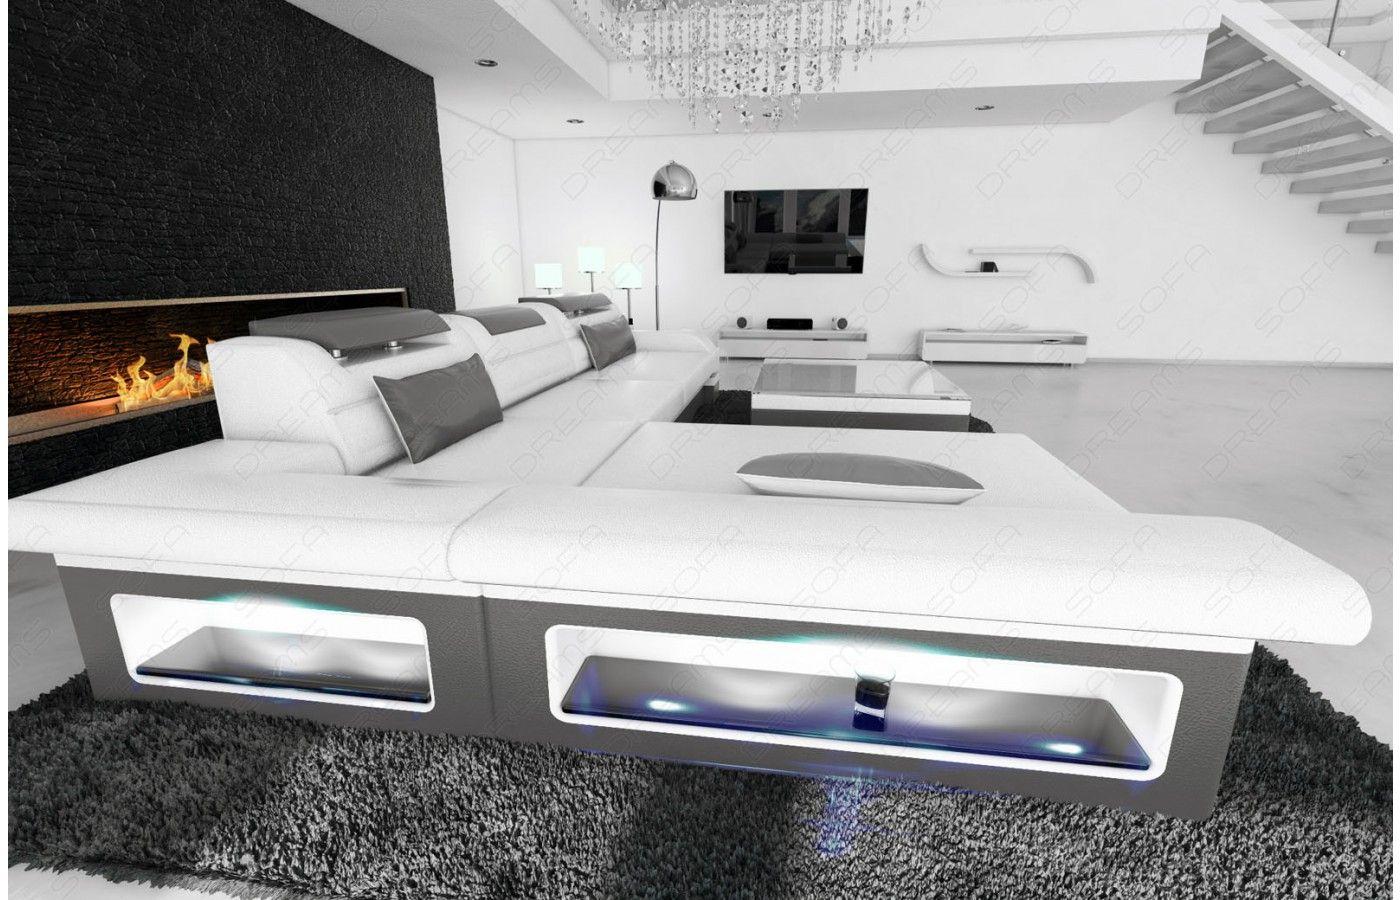 Exklusive Sofas designer ledersofa monza l form in weiß grau exklusiv bei sofa